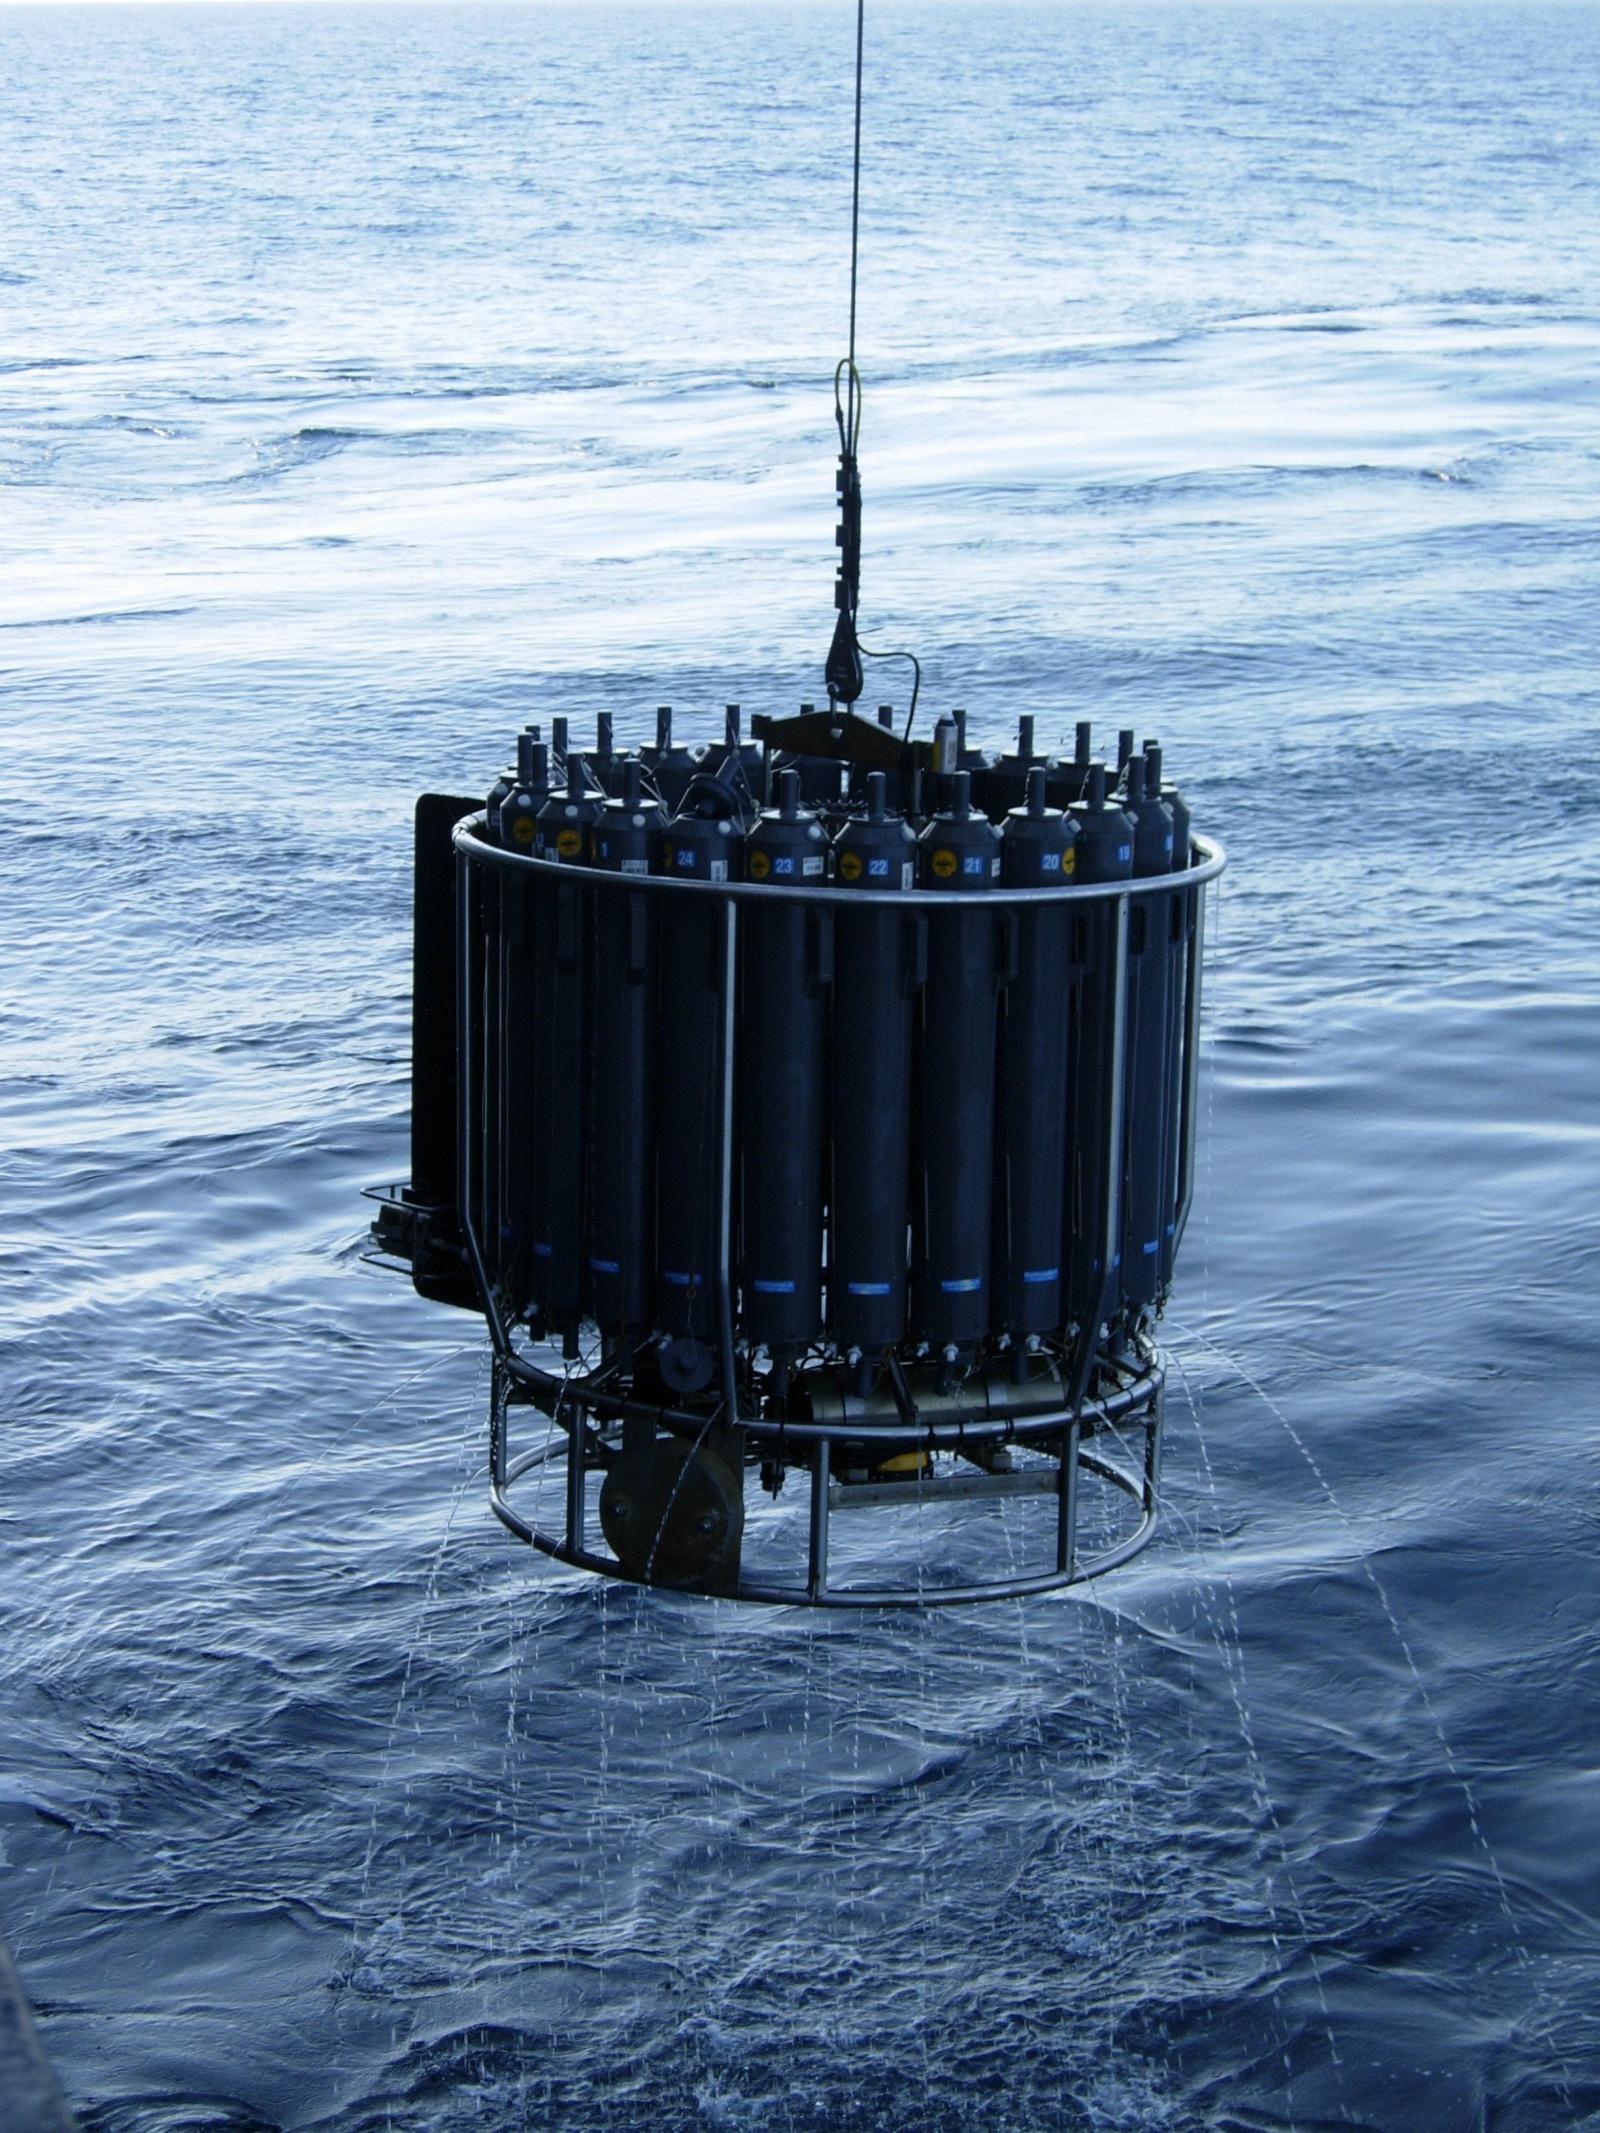 Methane sampling equipment